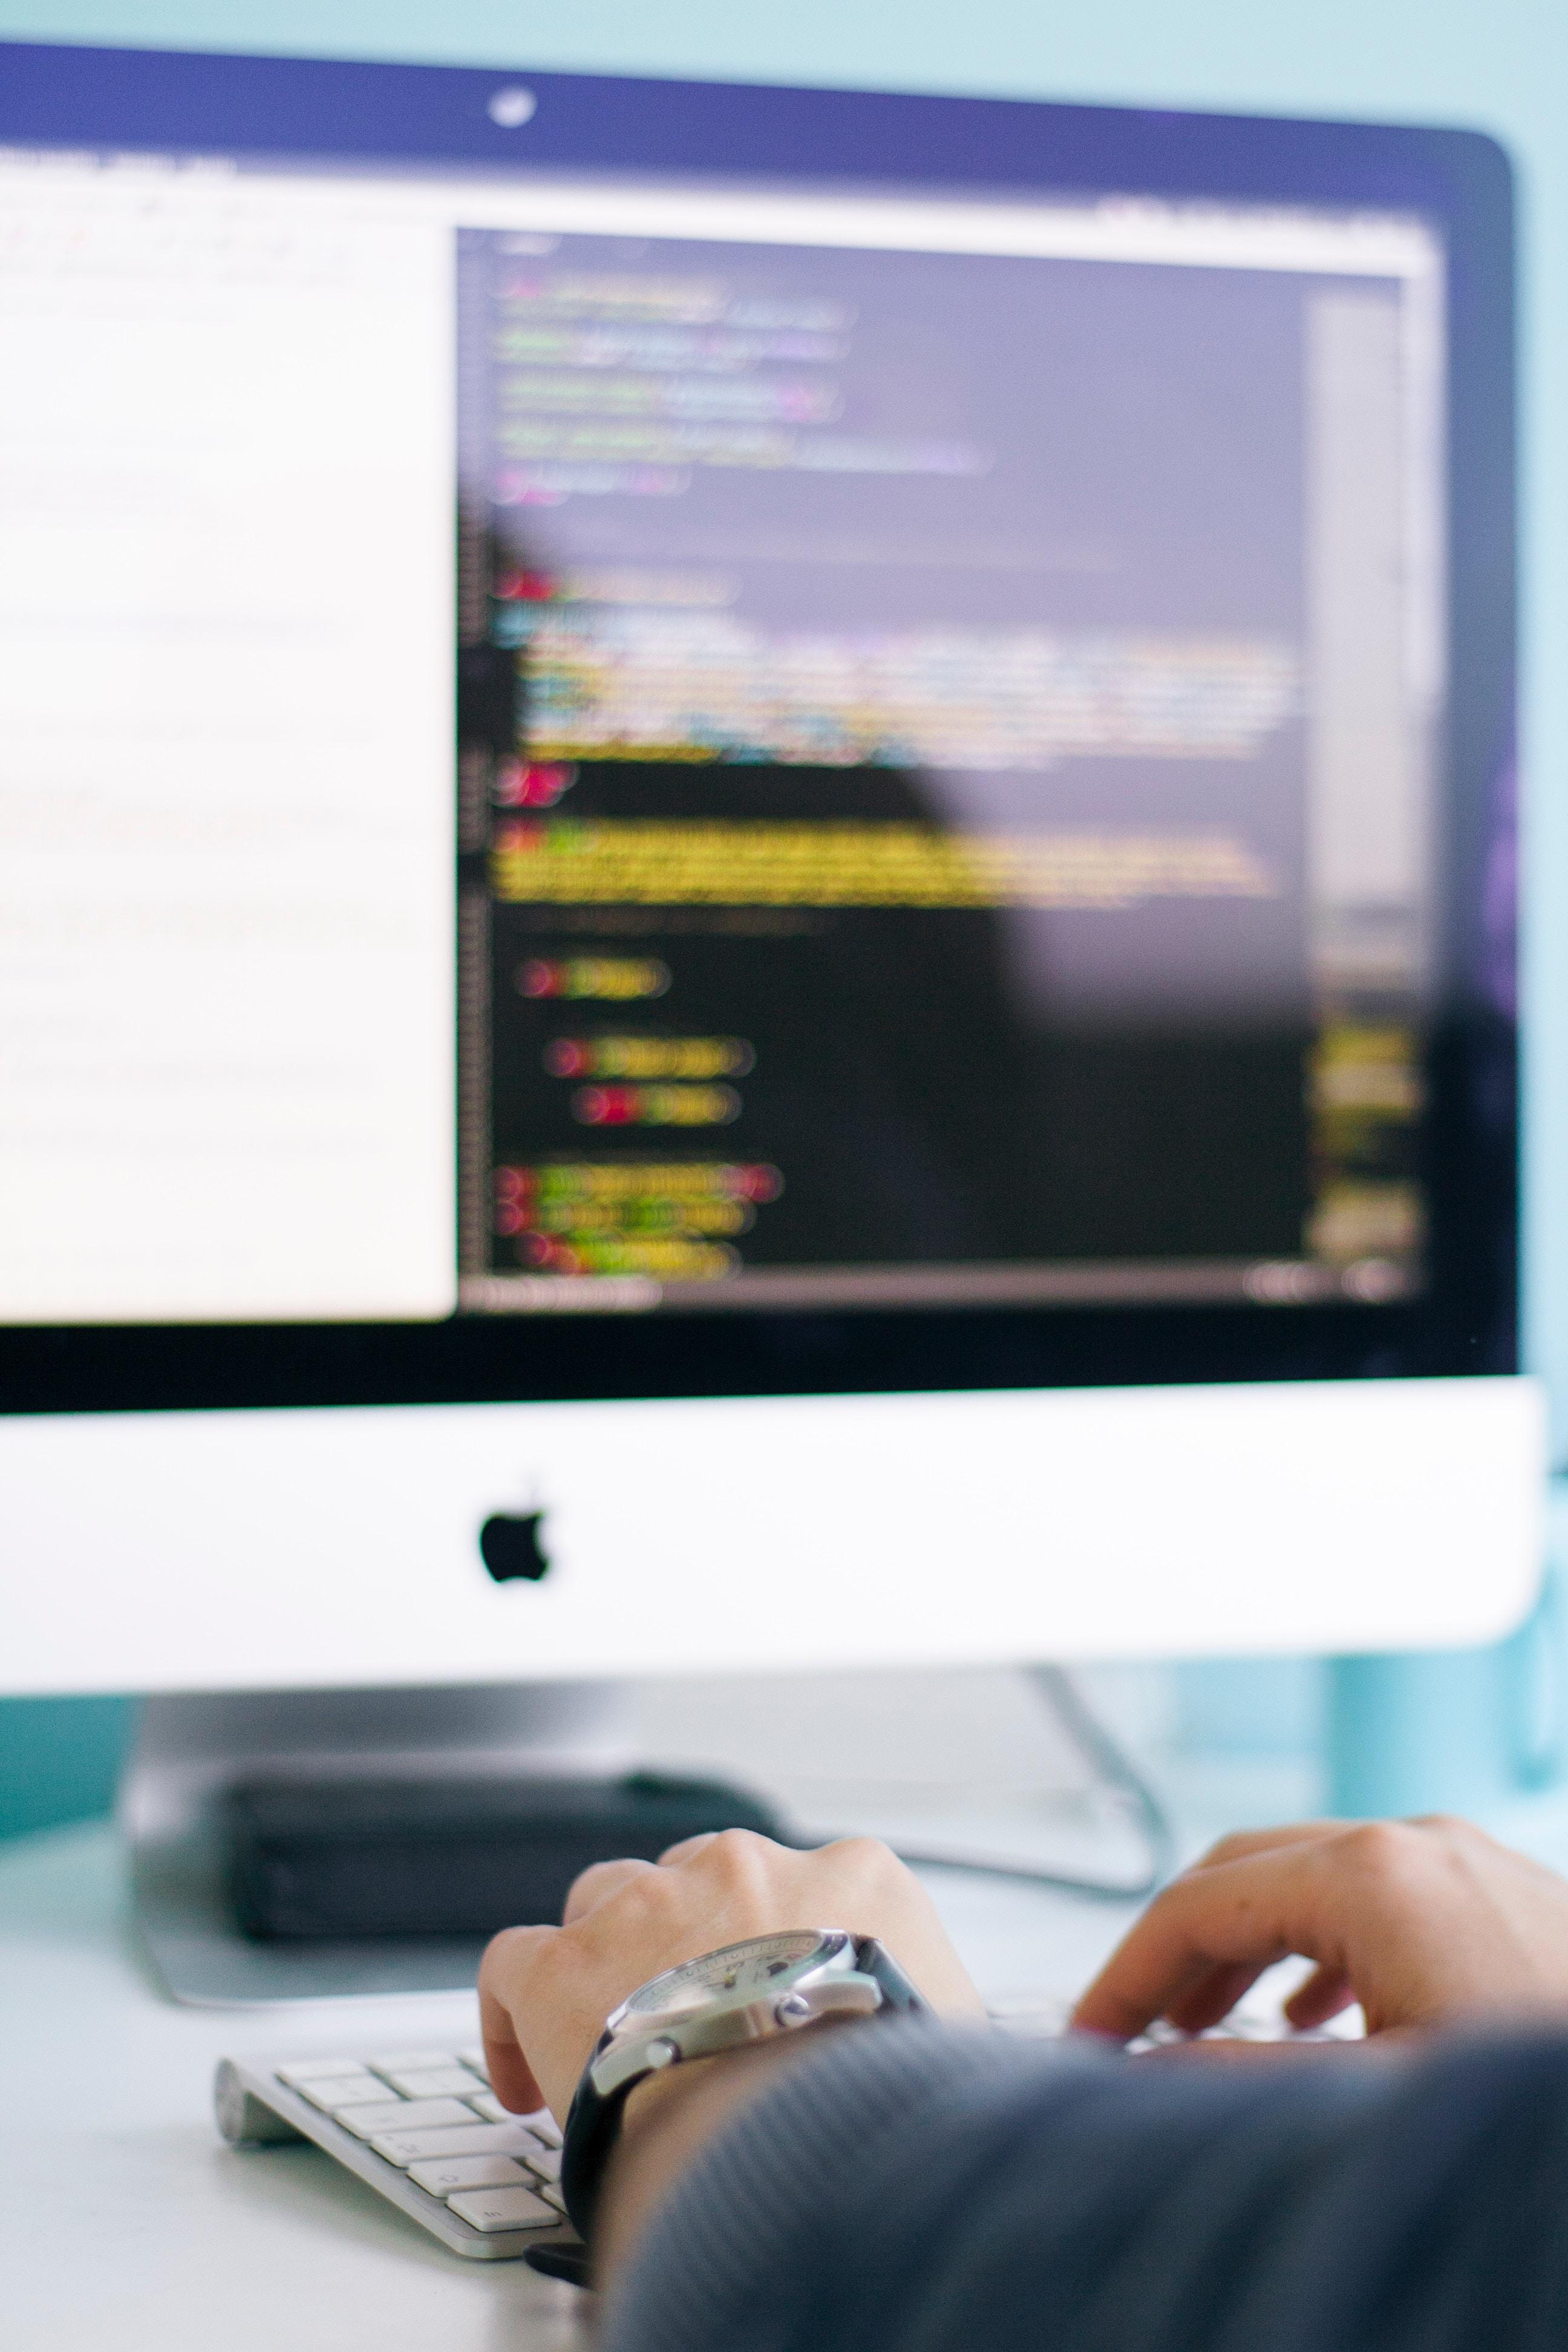 Learn the Super Easy HTML Basics